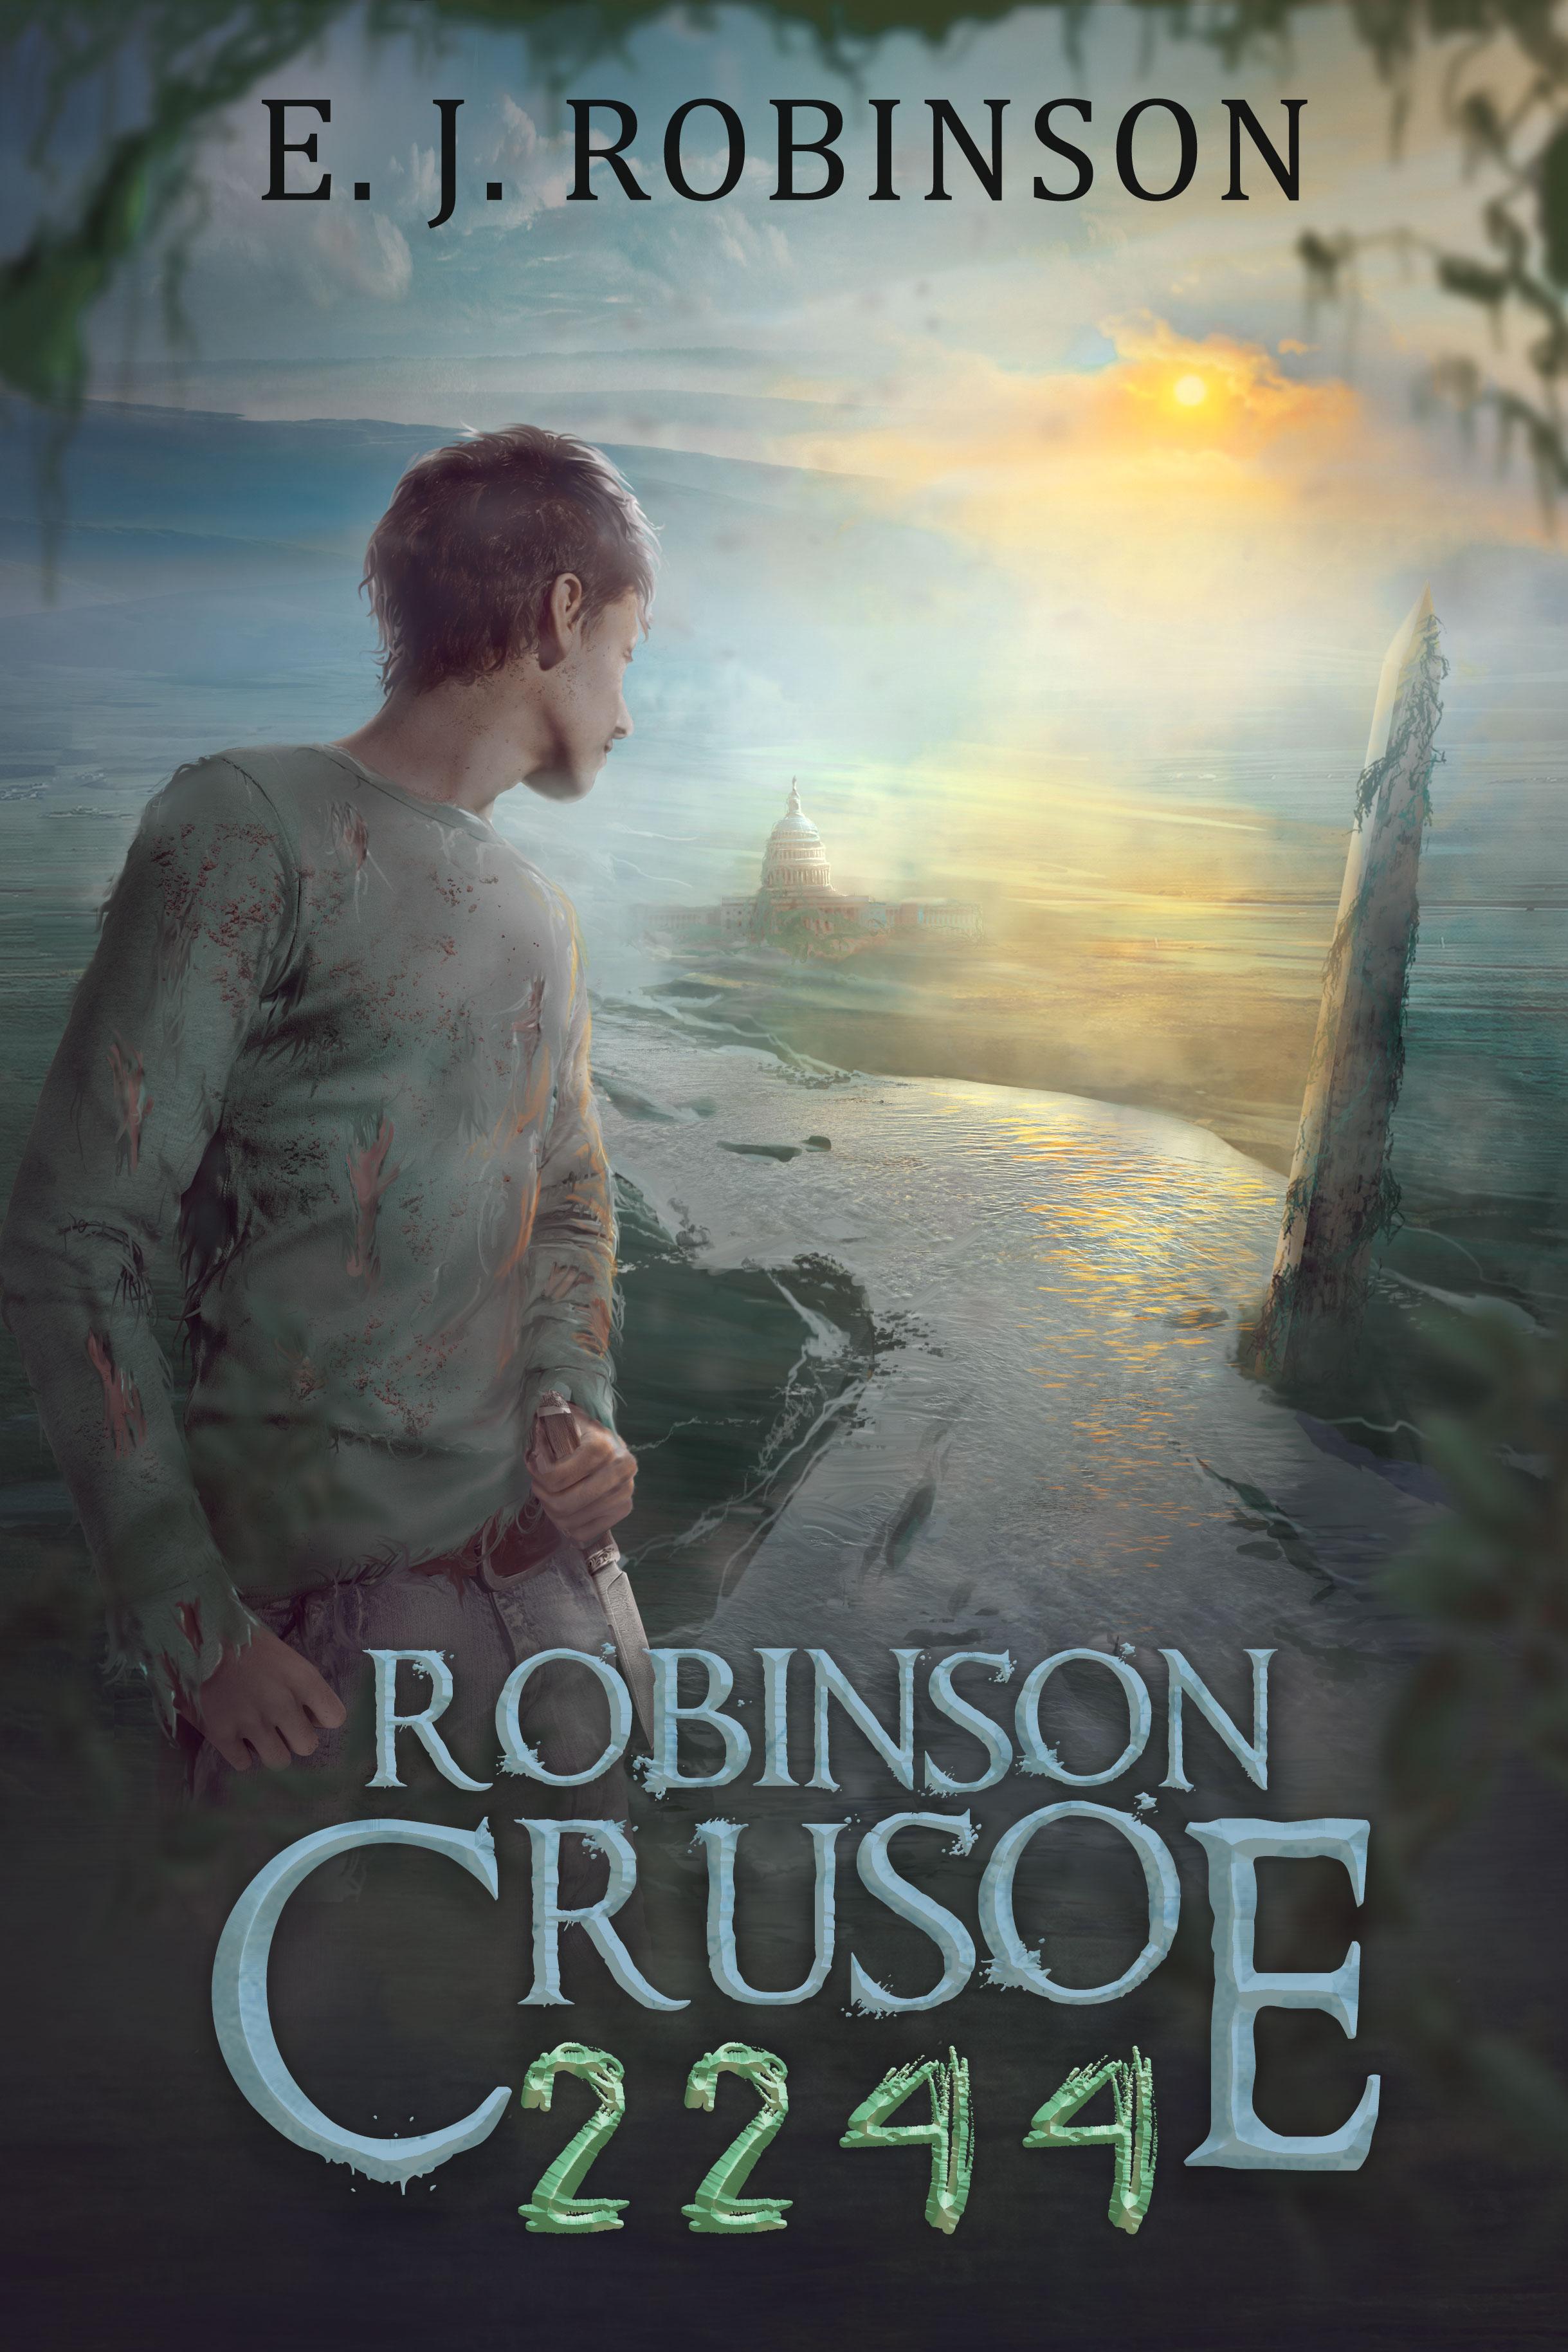 Robinson-Crusoe-2244-front-cover.jpg